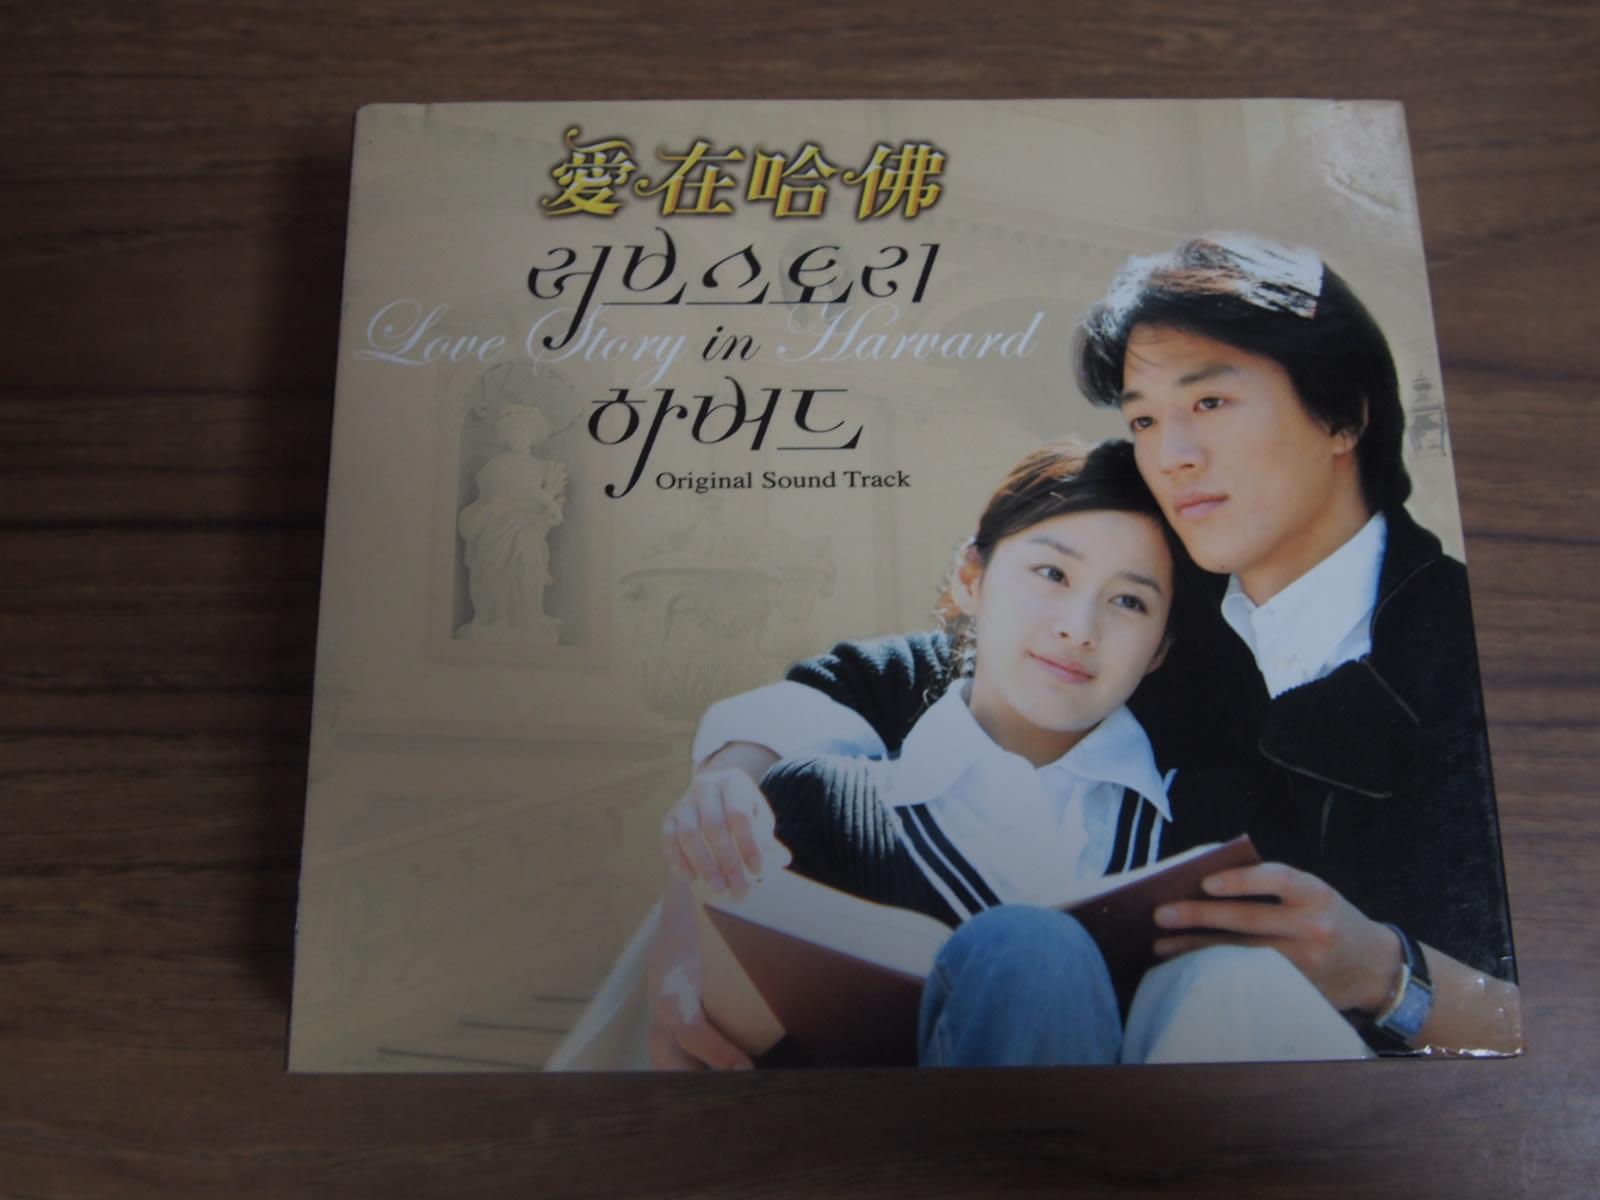 ◎MWM◎【二手CD】韓國 愛在哈佛電視原聲帶 CD+DVD 品項如圖